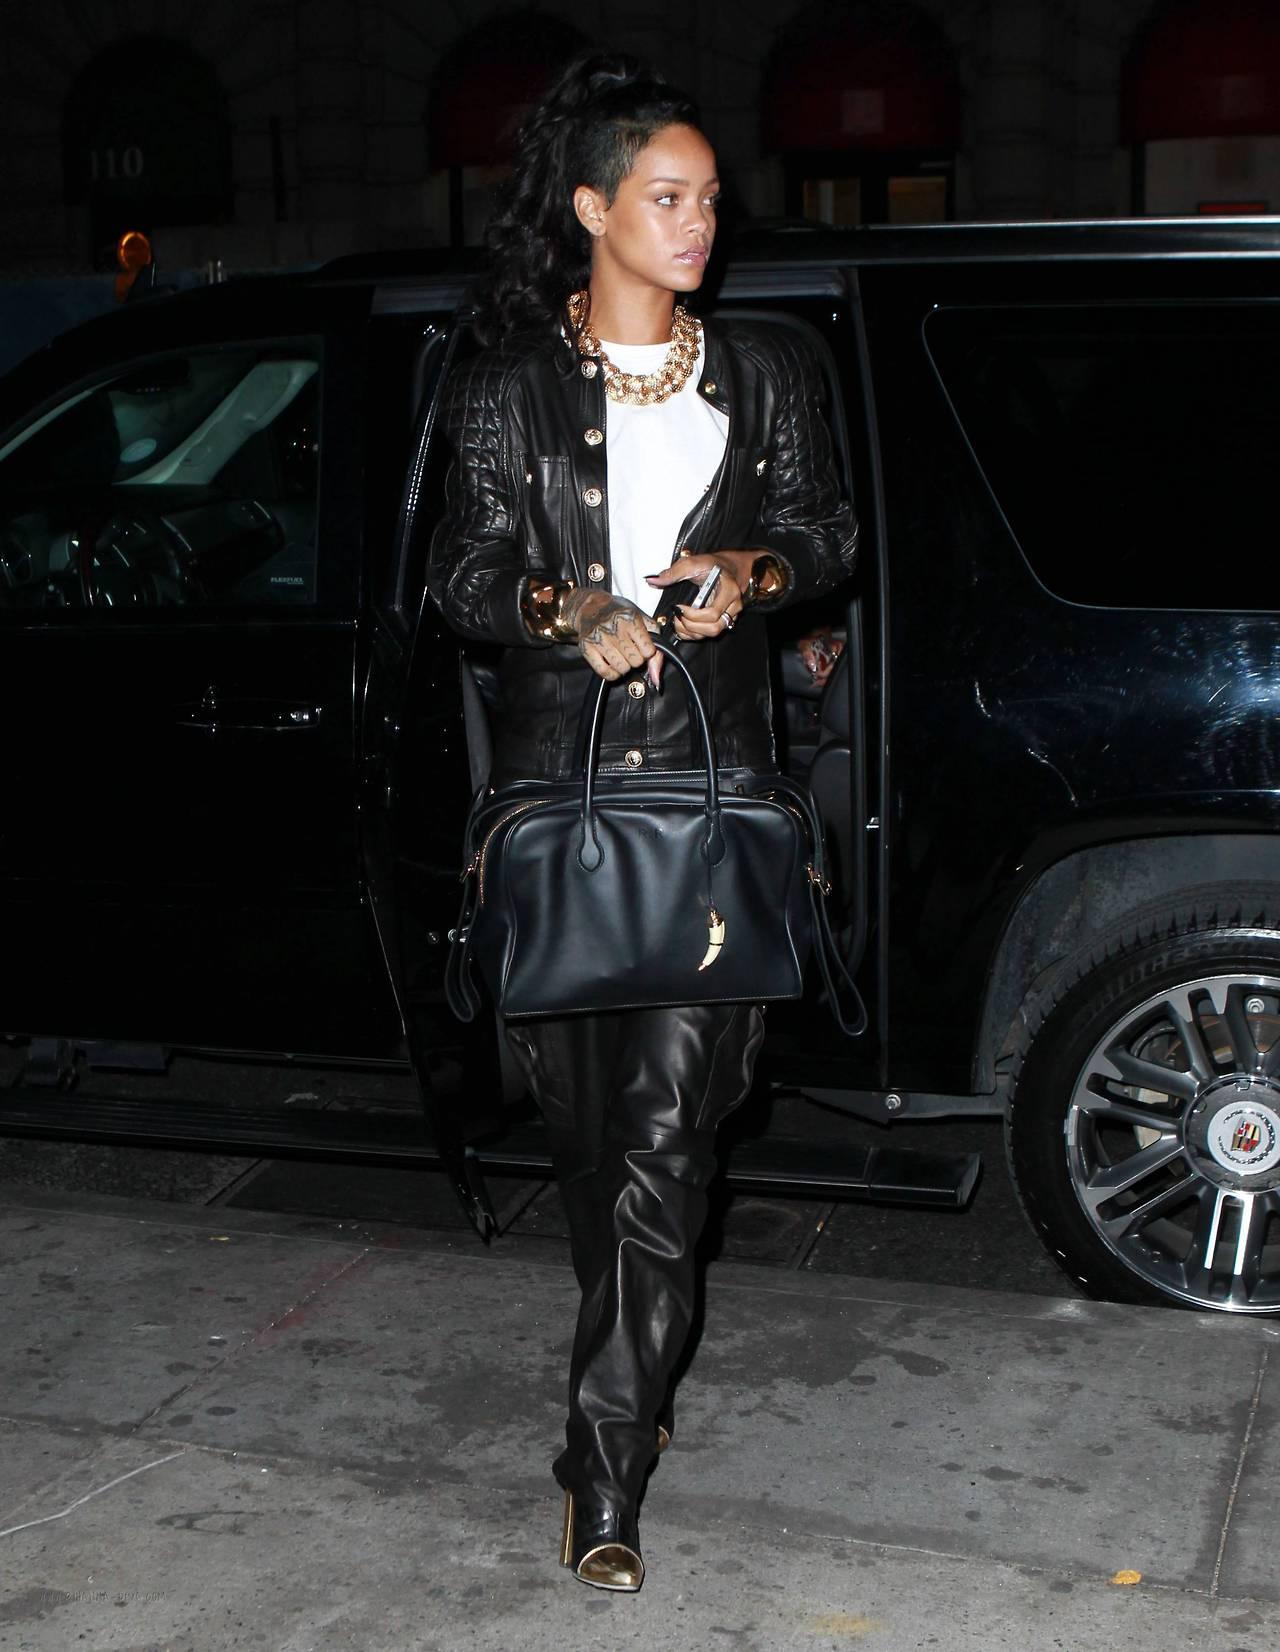 Rihanna for Balmain, Take Two, More Images!